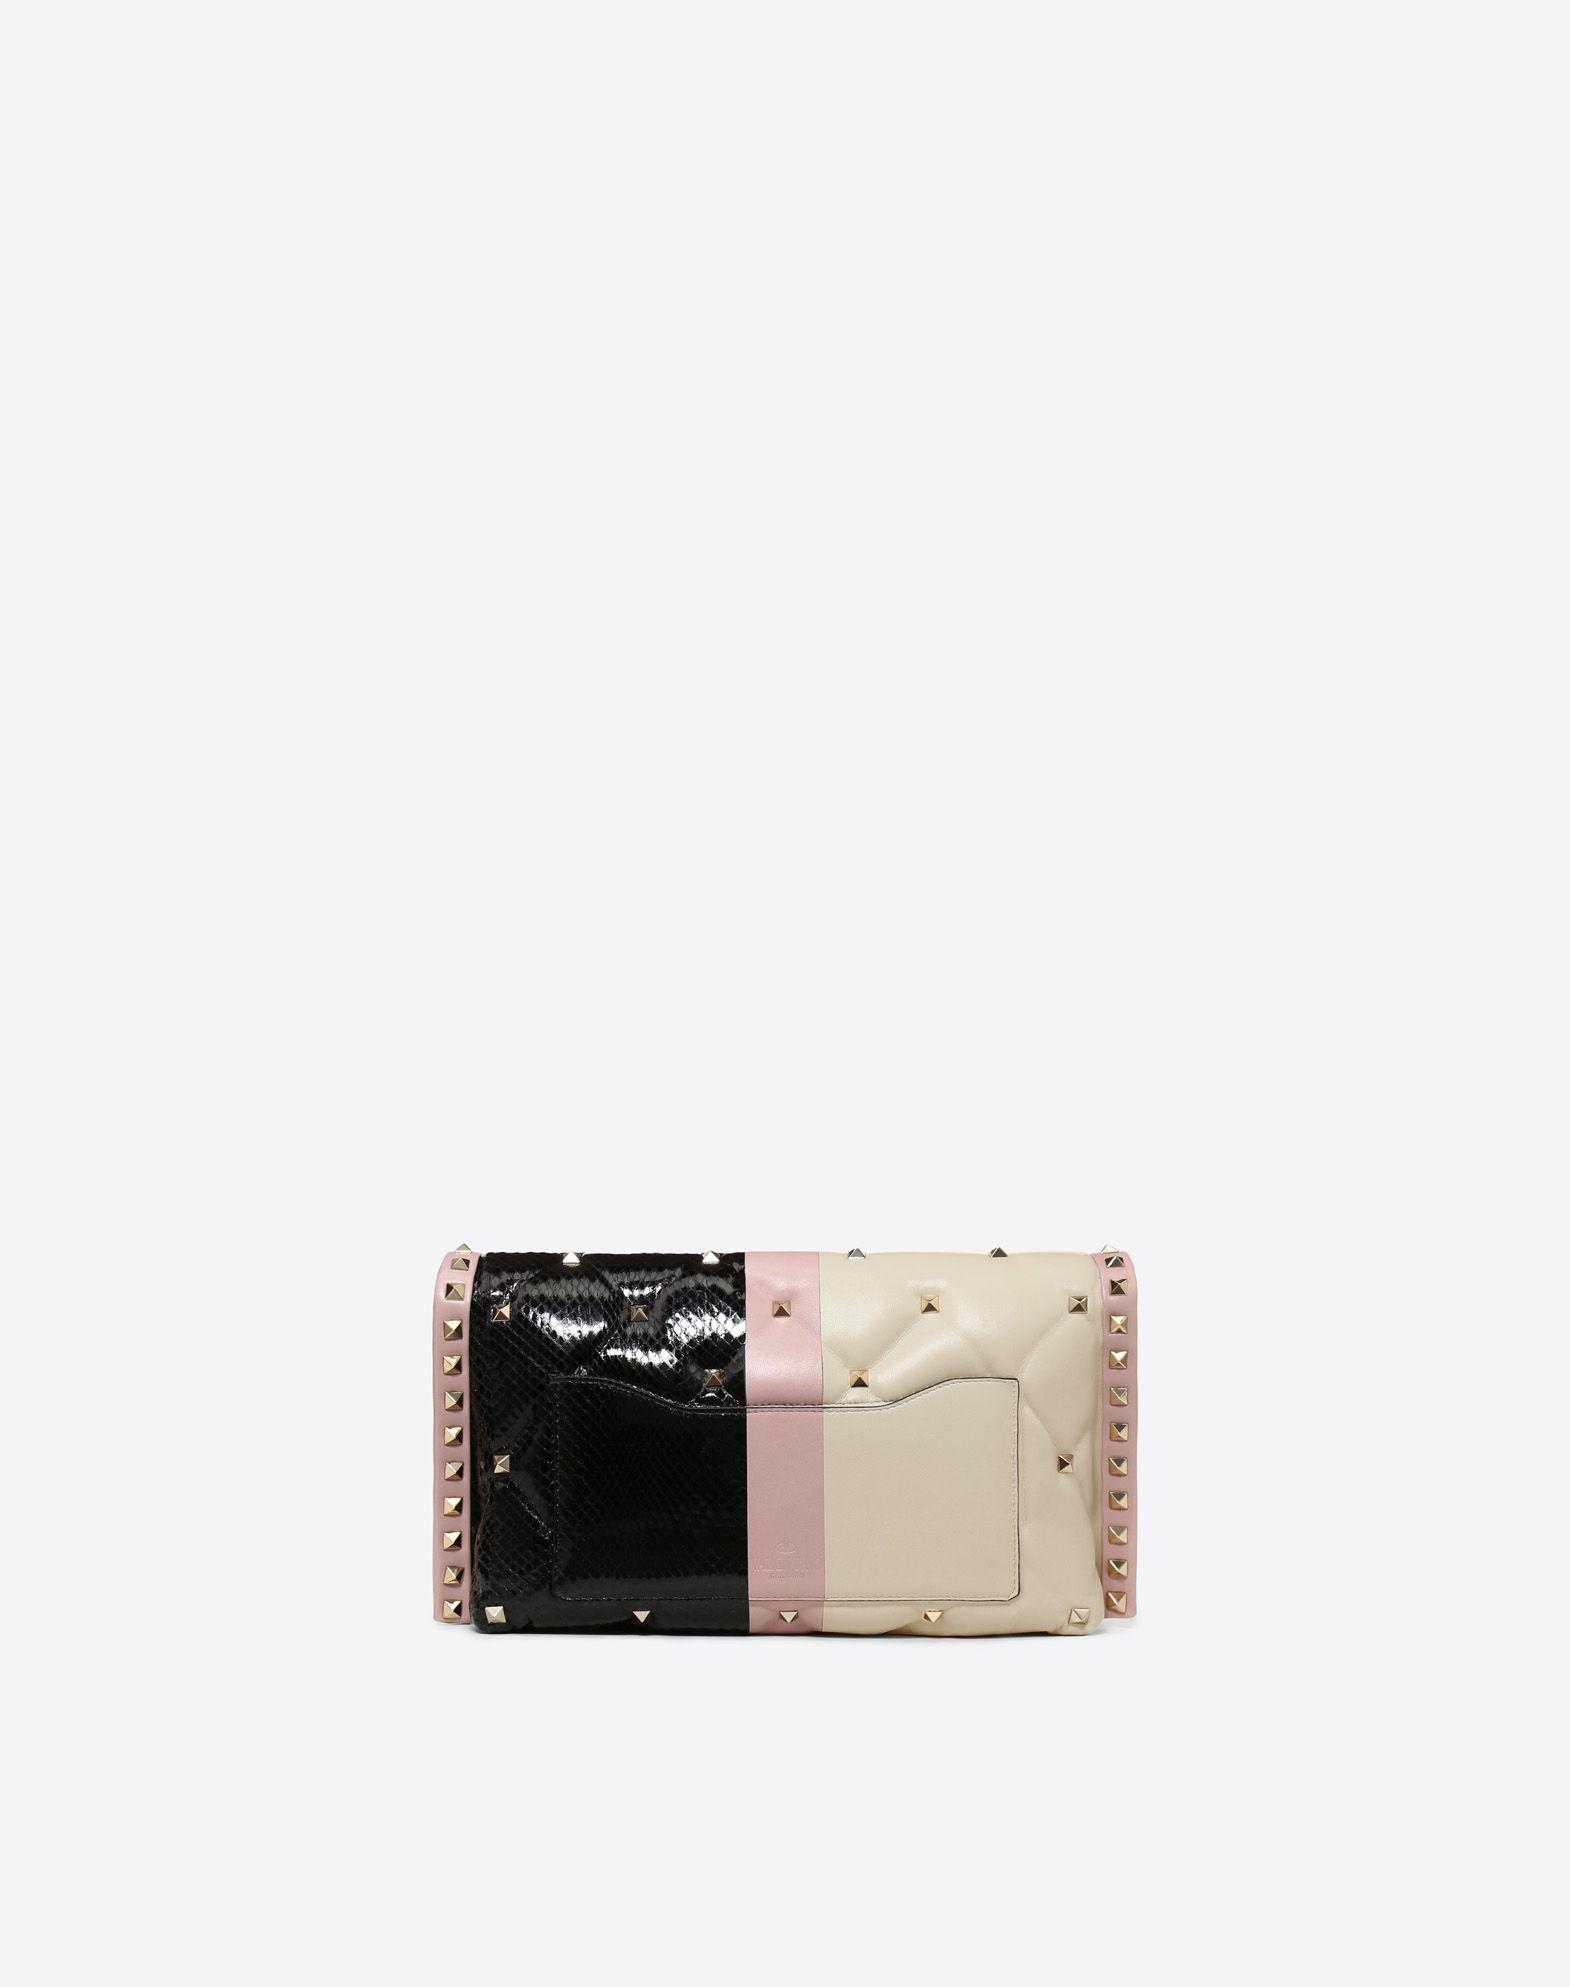 VALENTINO GARAVANI Candystud Cross-body Bag CROSS BODY BAG D d